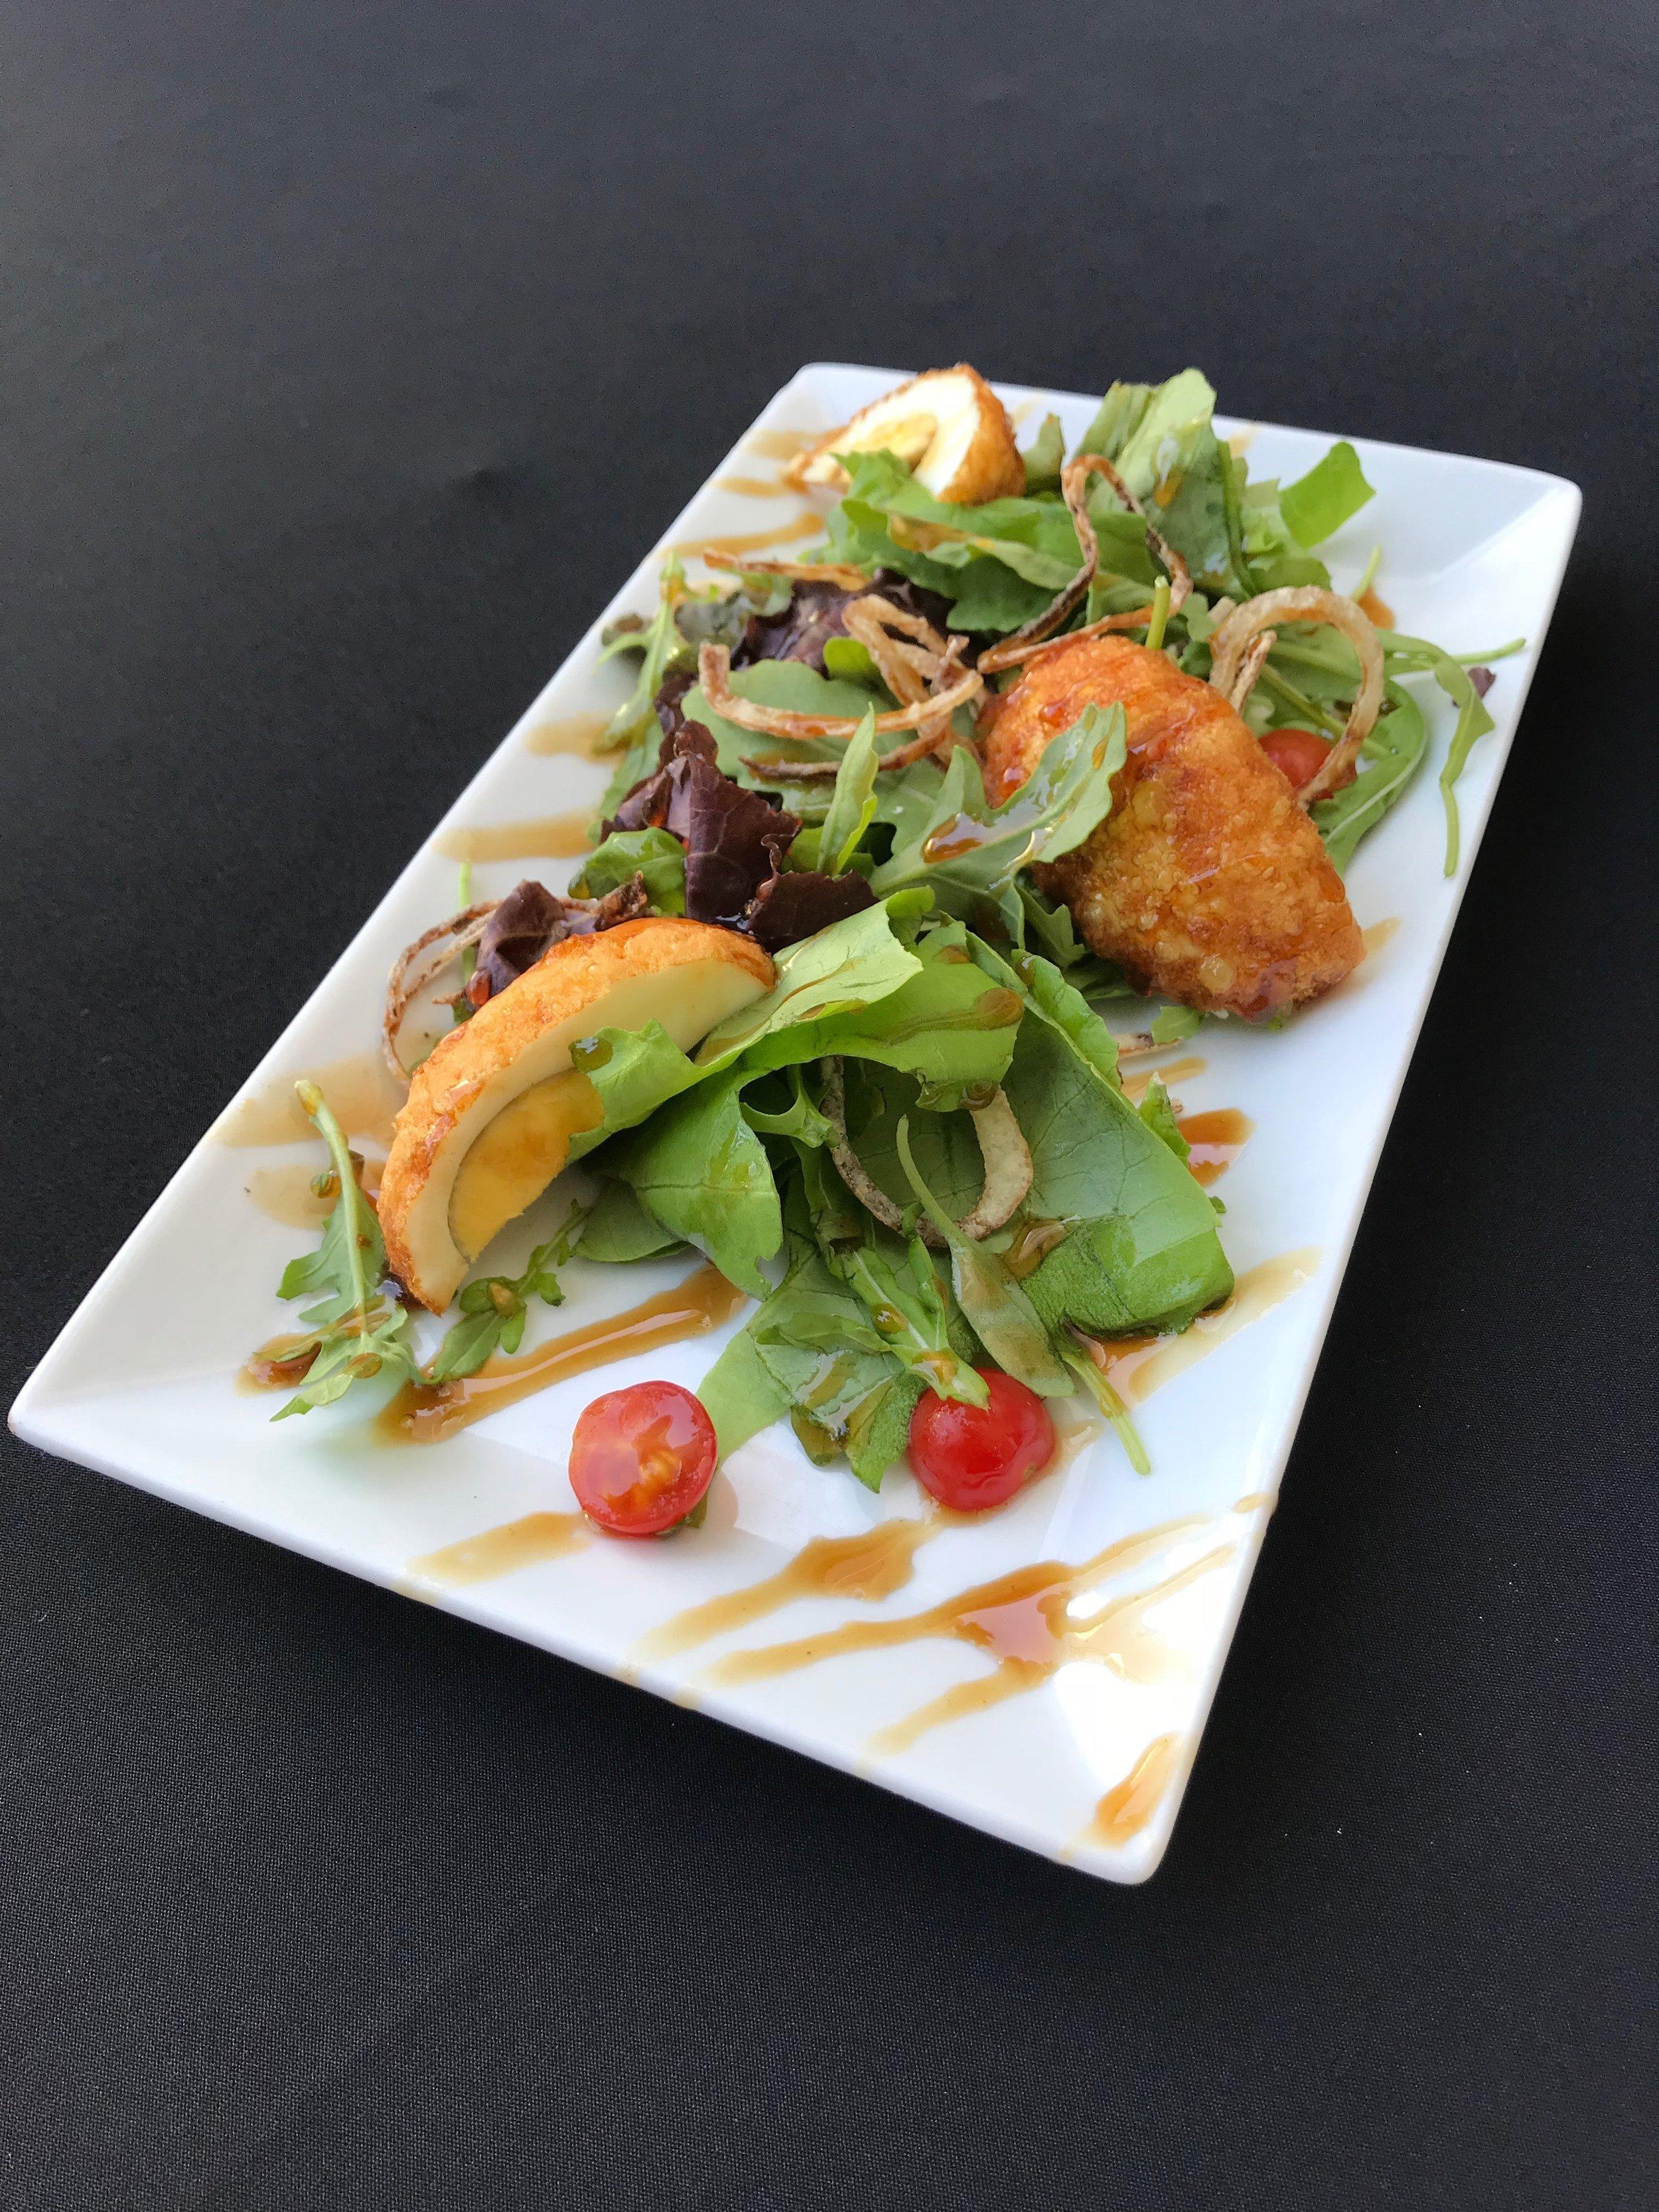 - Arugula & Tamarind Salad Arugula, mixed greens, fried shallots, and hardboiled egg, served with a tamarind & fish sauce vinaigrette